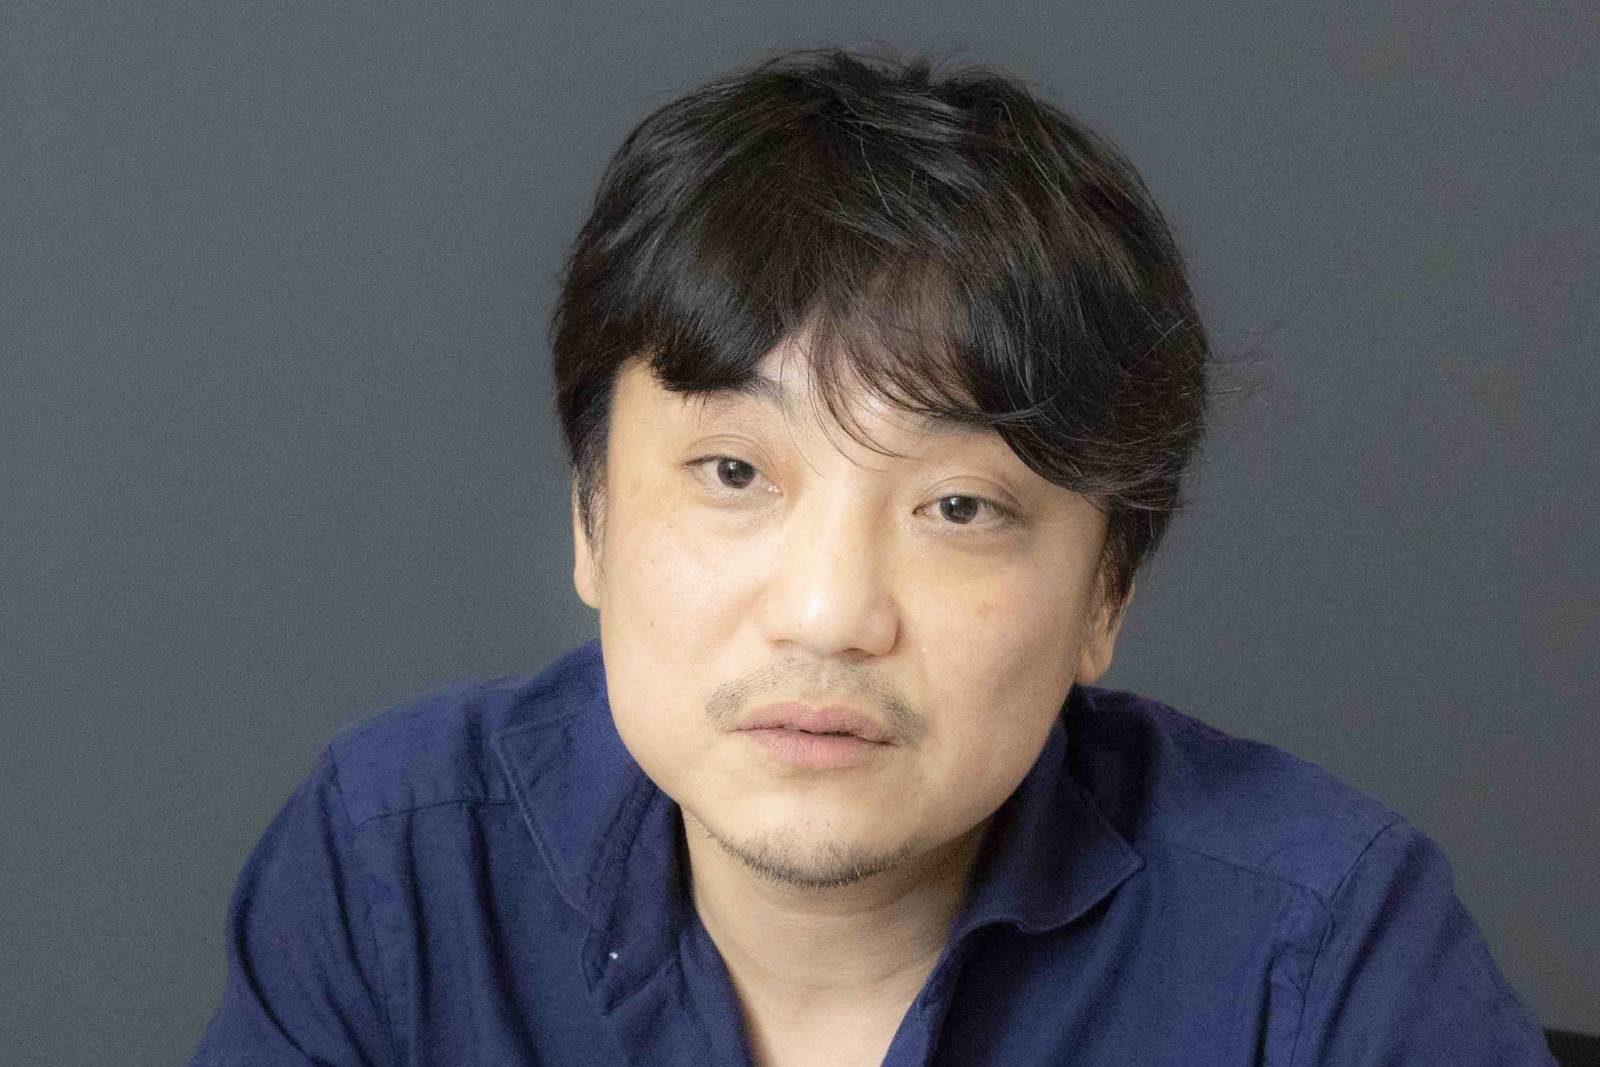 國光宏尚氏 株式会社フィナンシェ Founder/株式会社gumi 代表取締役会長